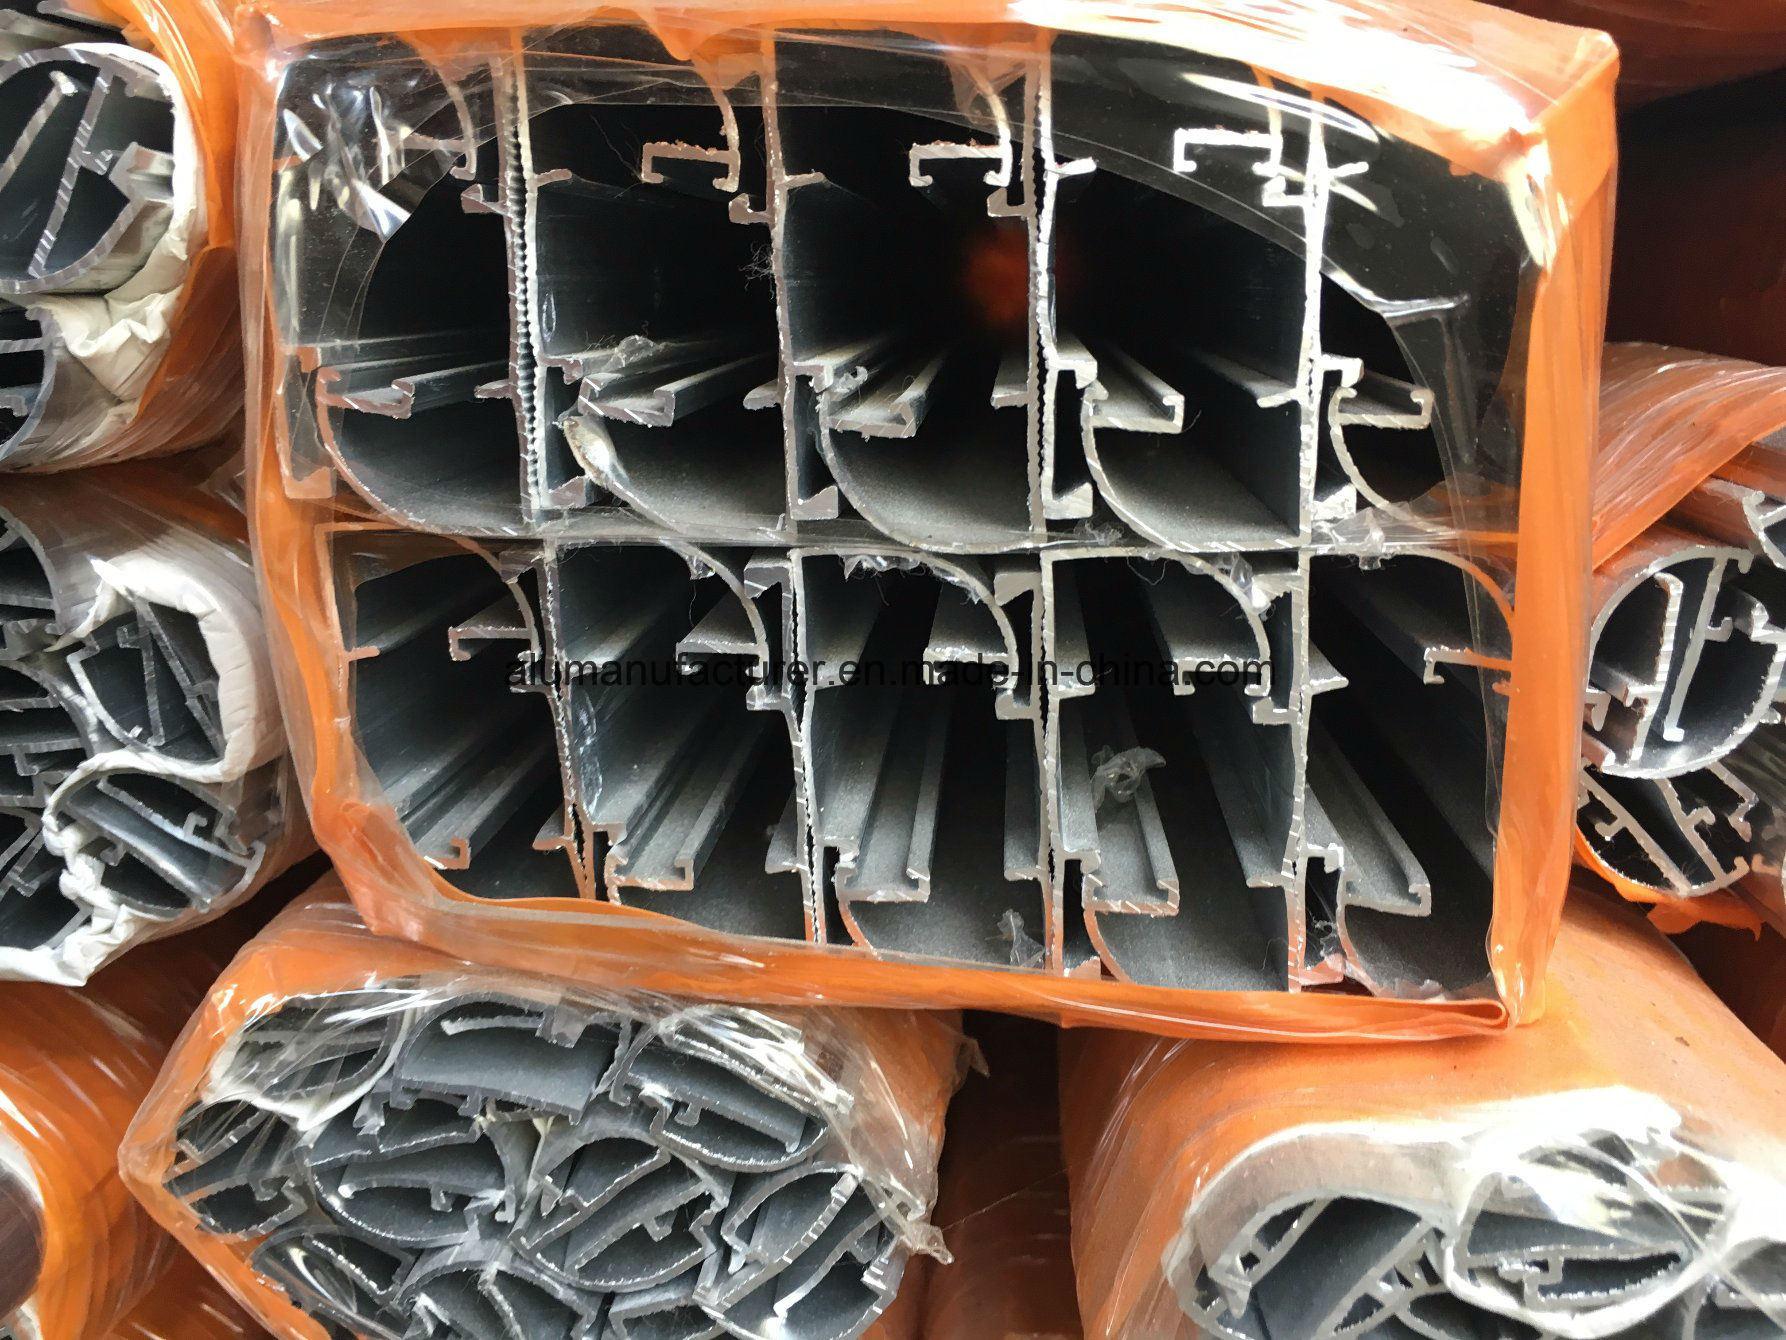 Iraq Glass Clip Aluminium Alloy Extrusion Profile for Door and Window (02 Series)